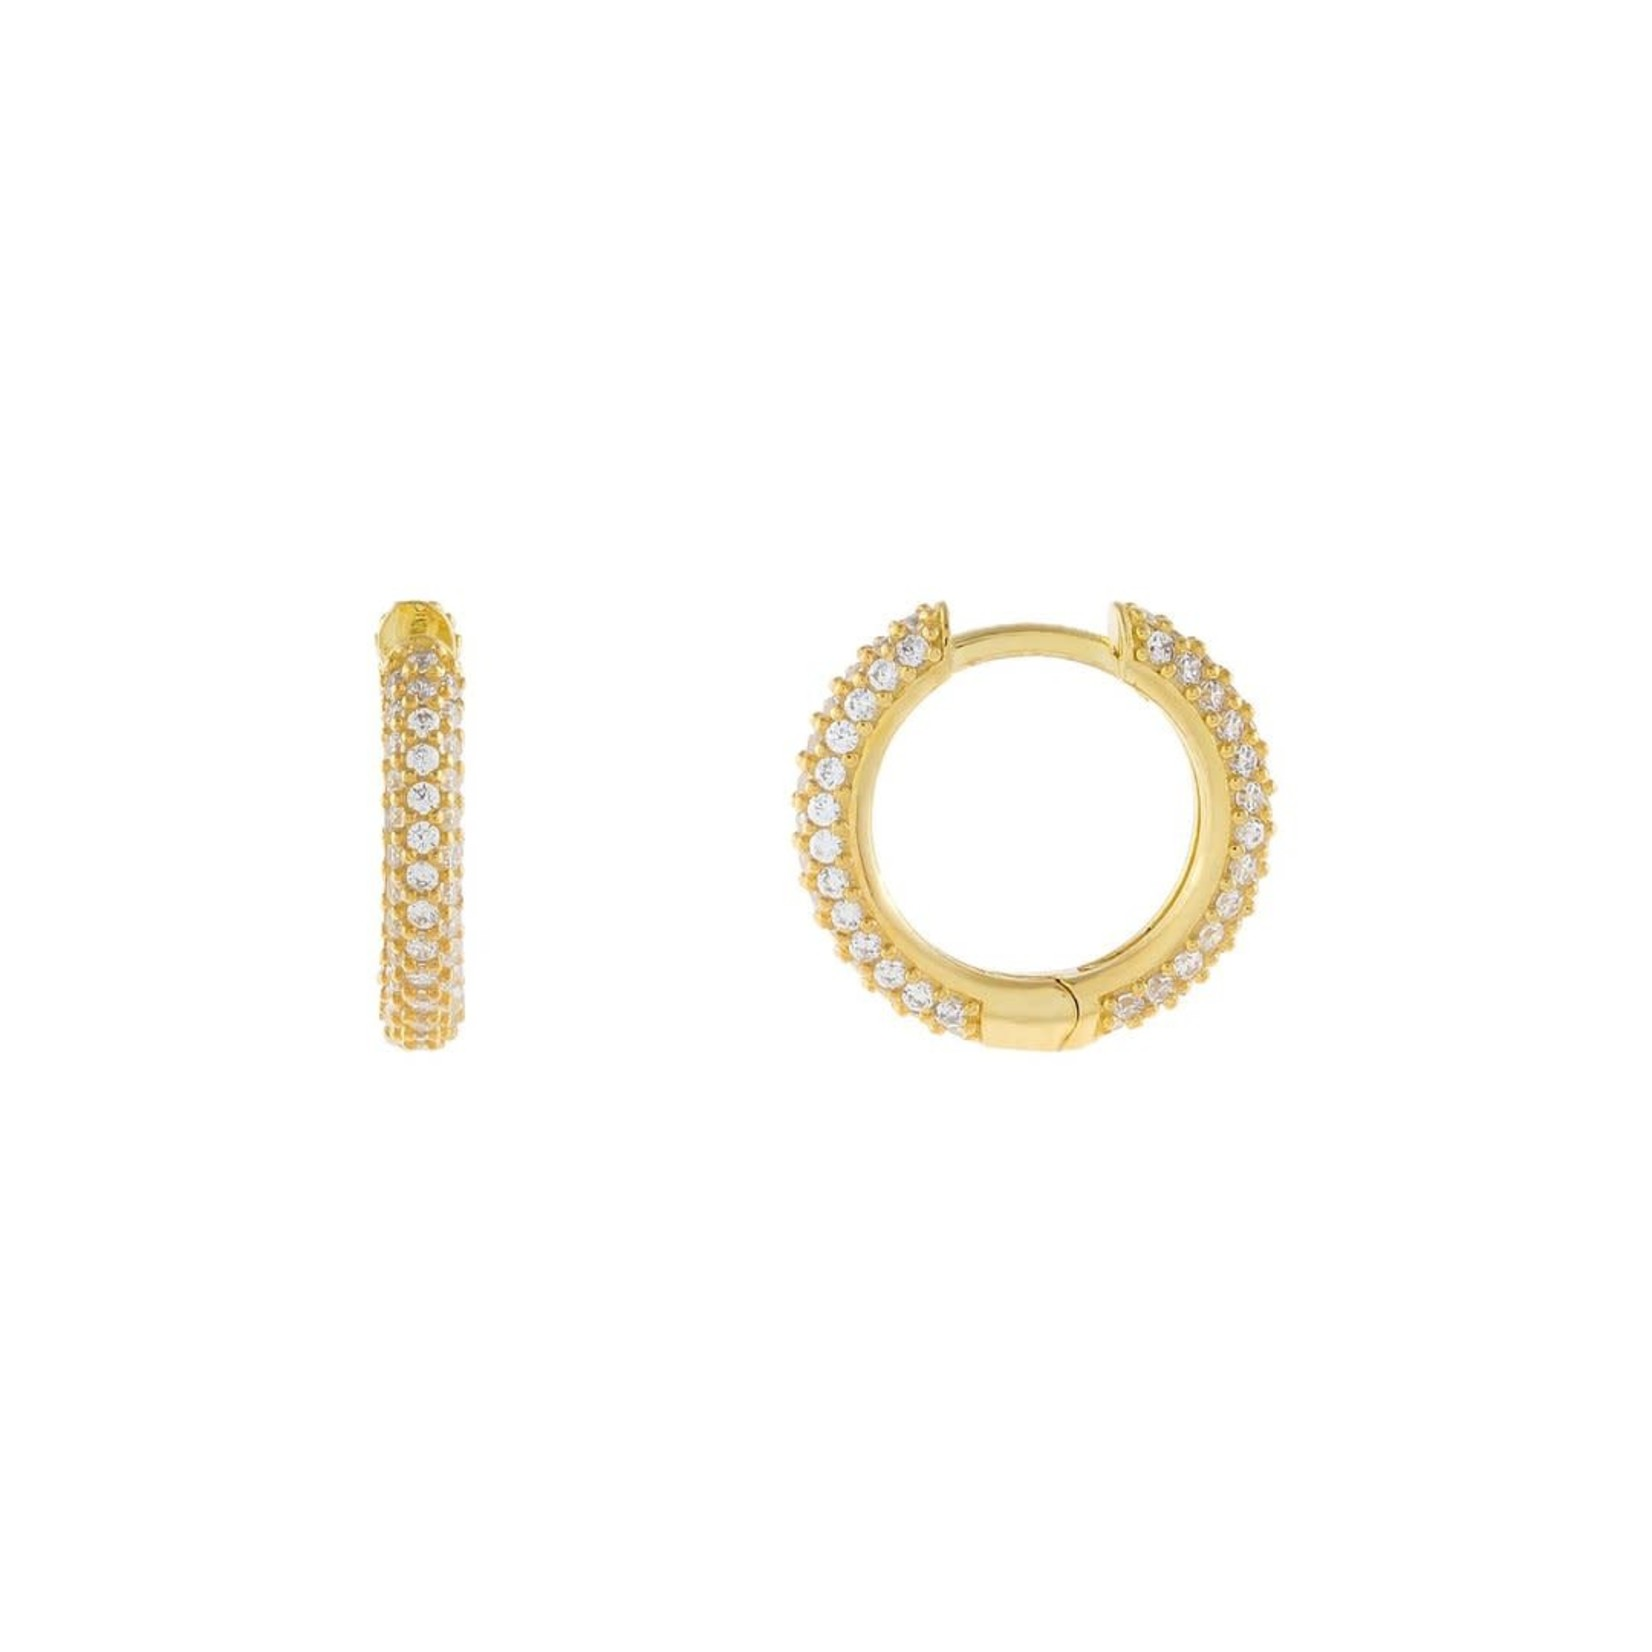 Adinas Pave Huggie Earrings